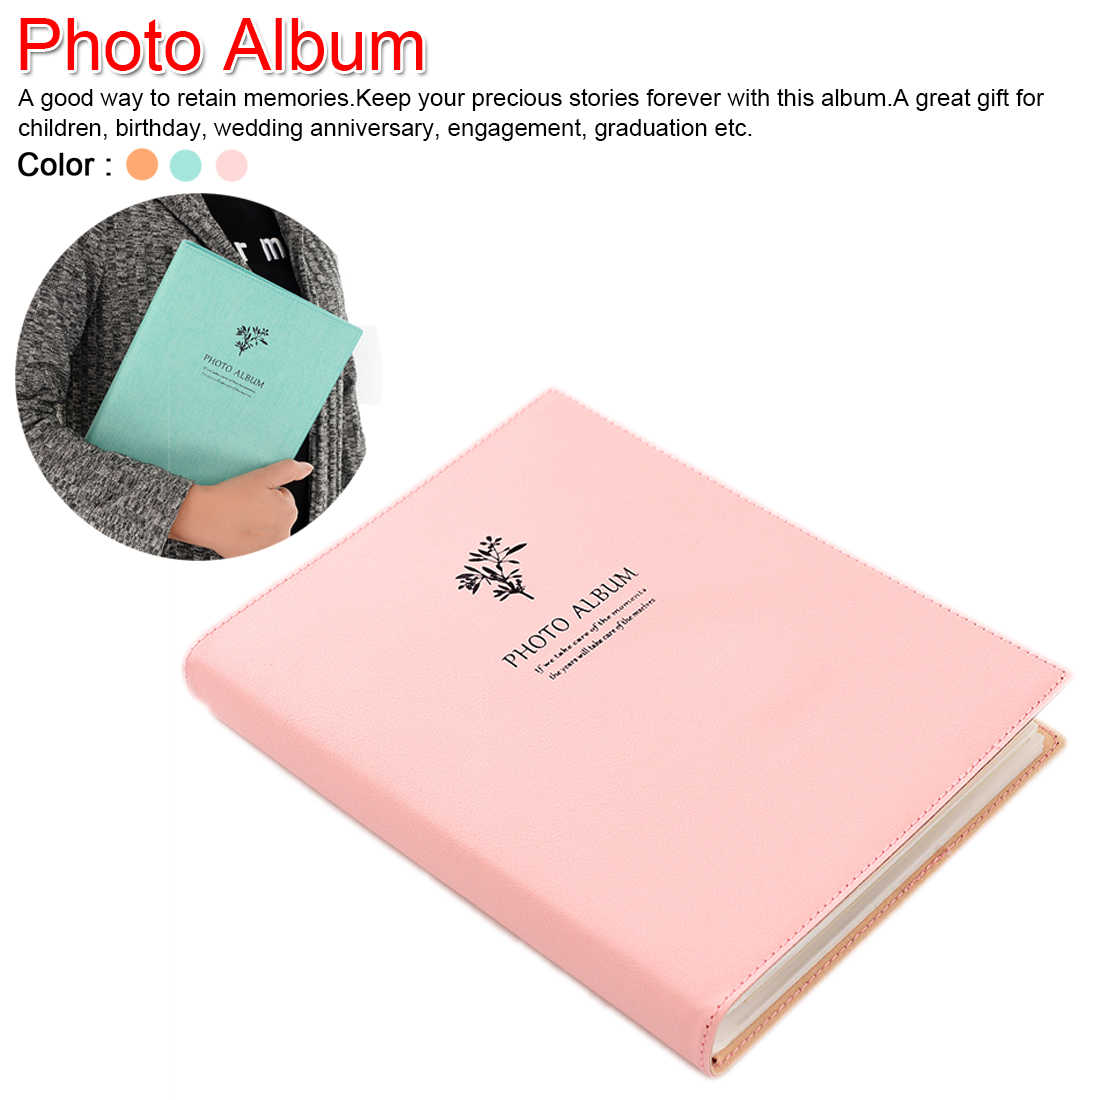 6 inch Insert Photo Album 80 Pages Scrapbook Paper Baby Family Scrapbook Albums Wedding Photo Album